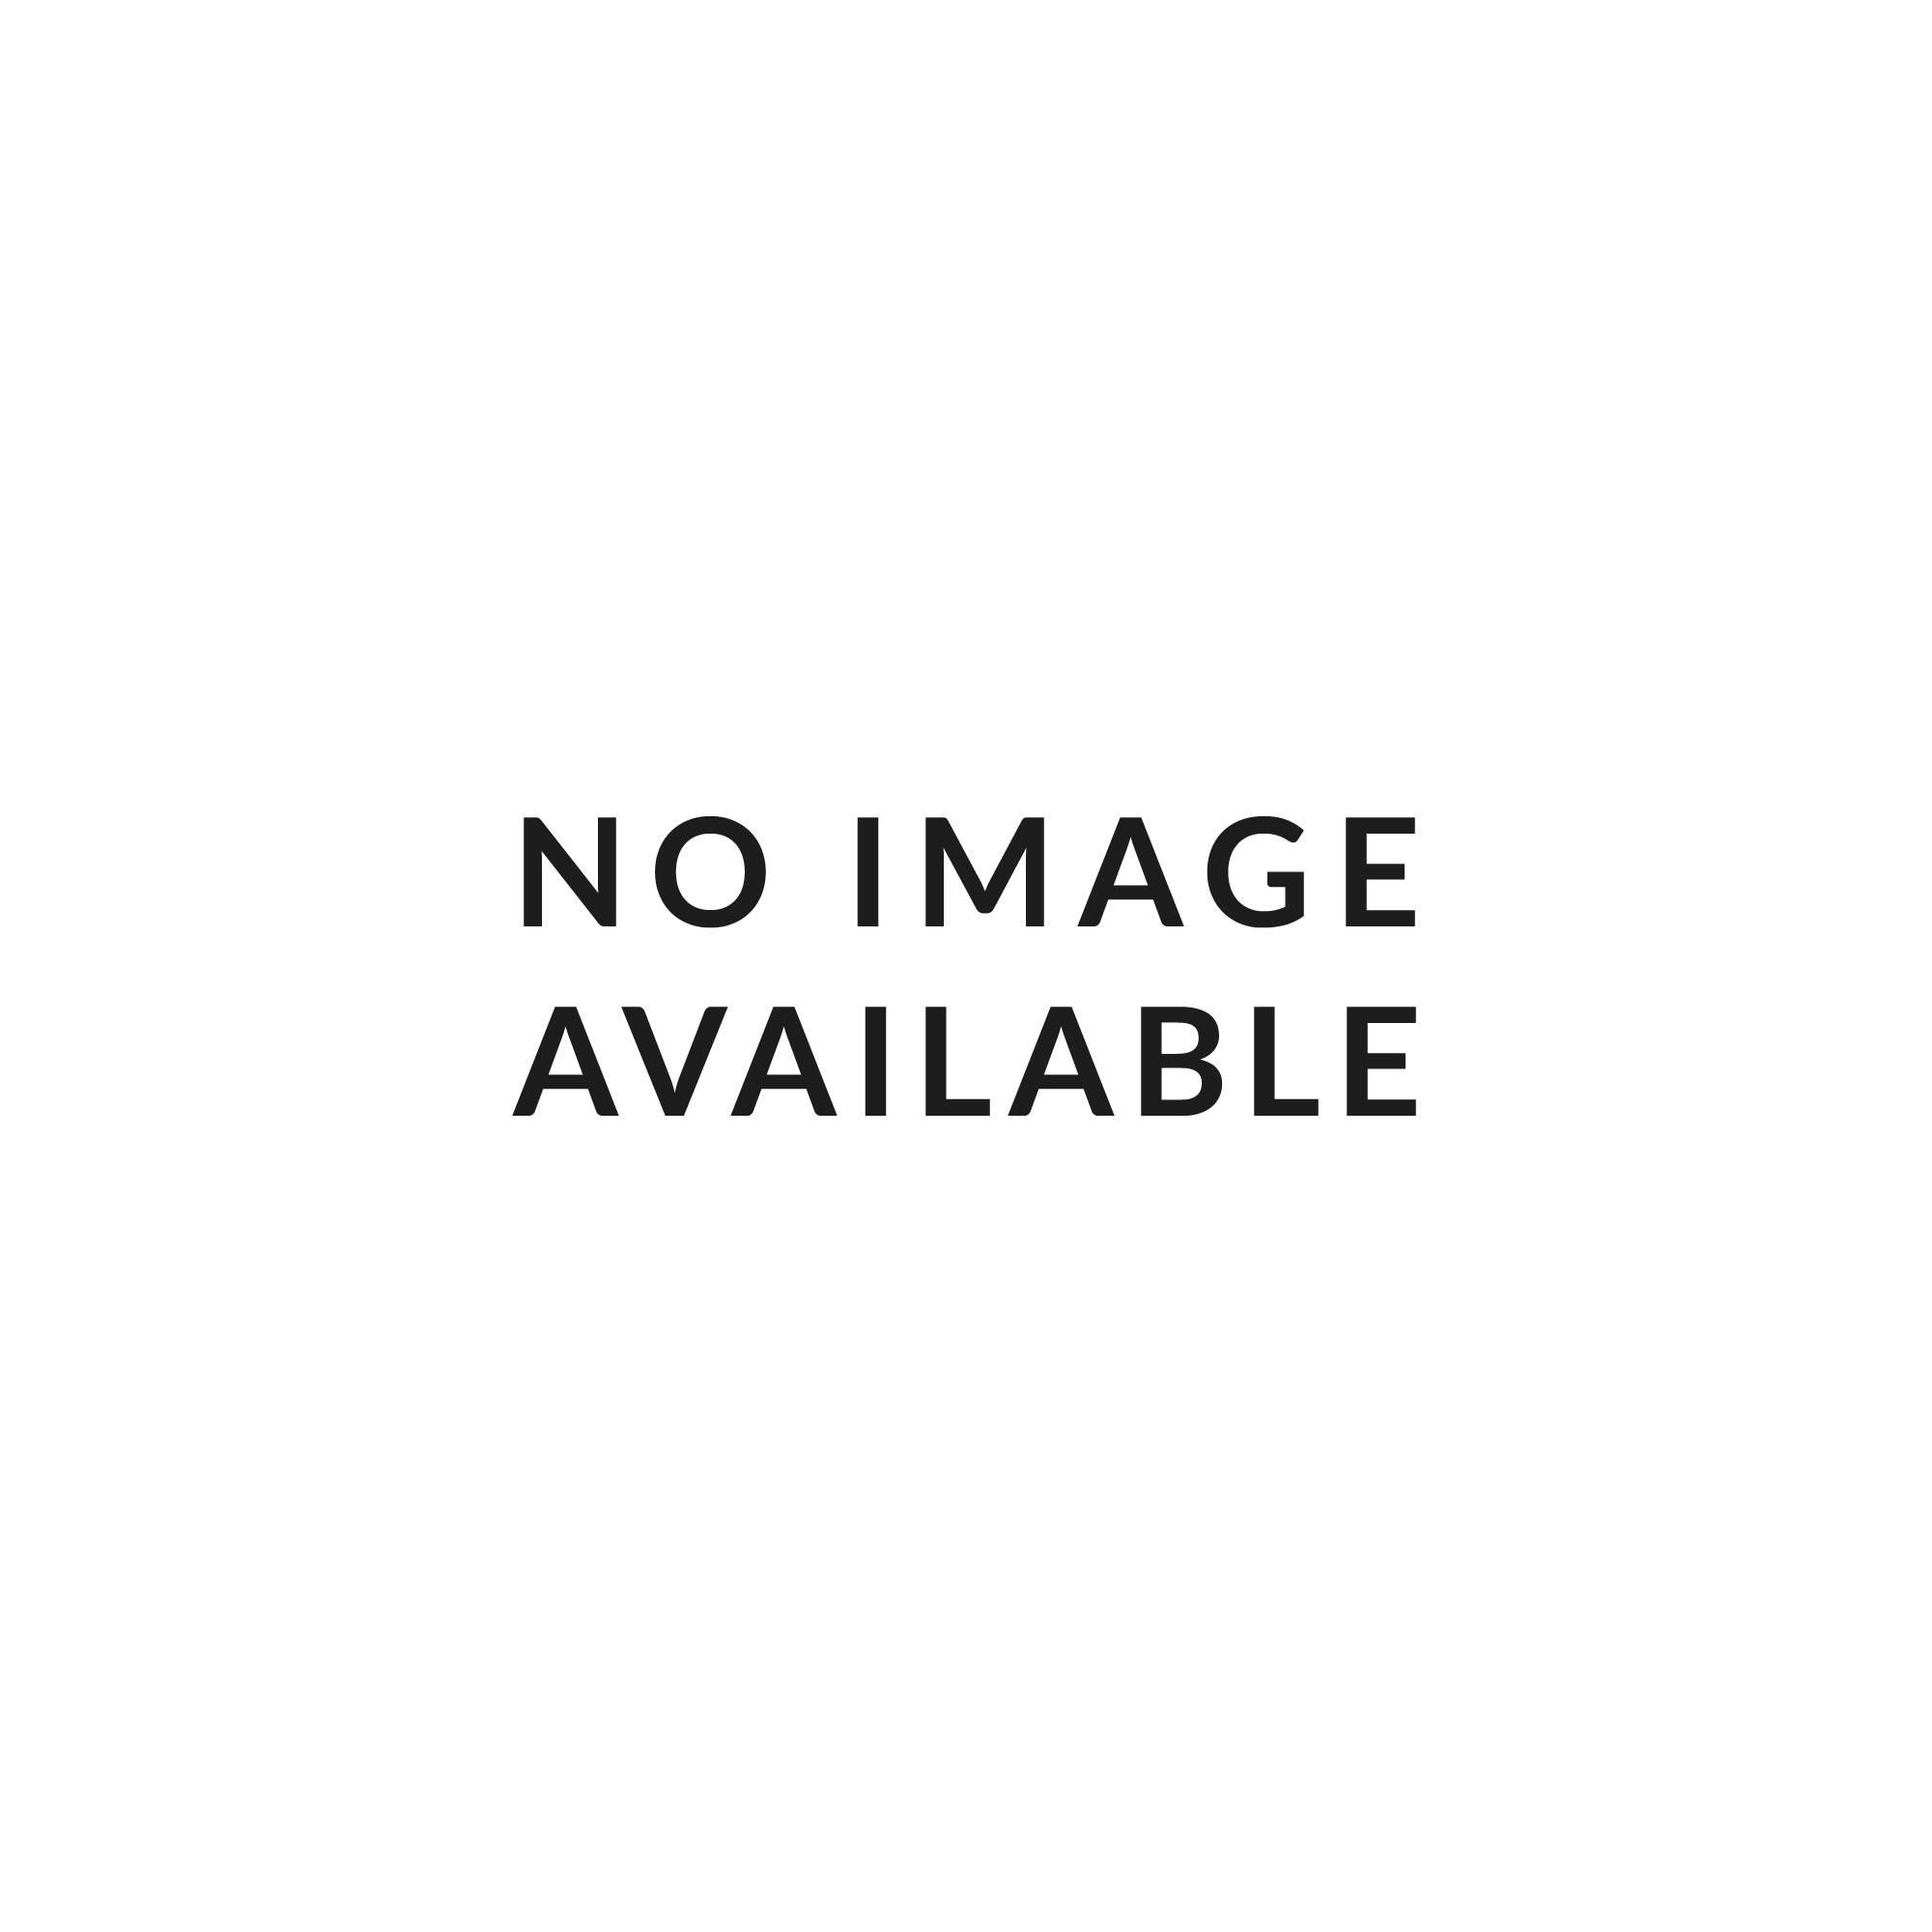 Goodwins 18ct White Gold Emerald Diamond Dress Ring Ladies From Goodwins Jewellers Uk